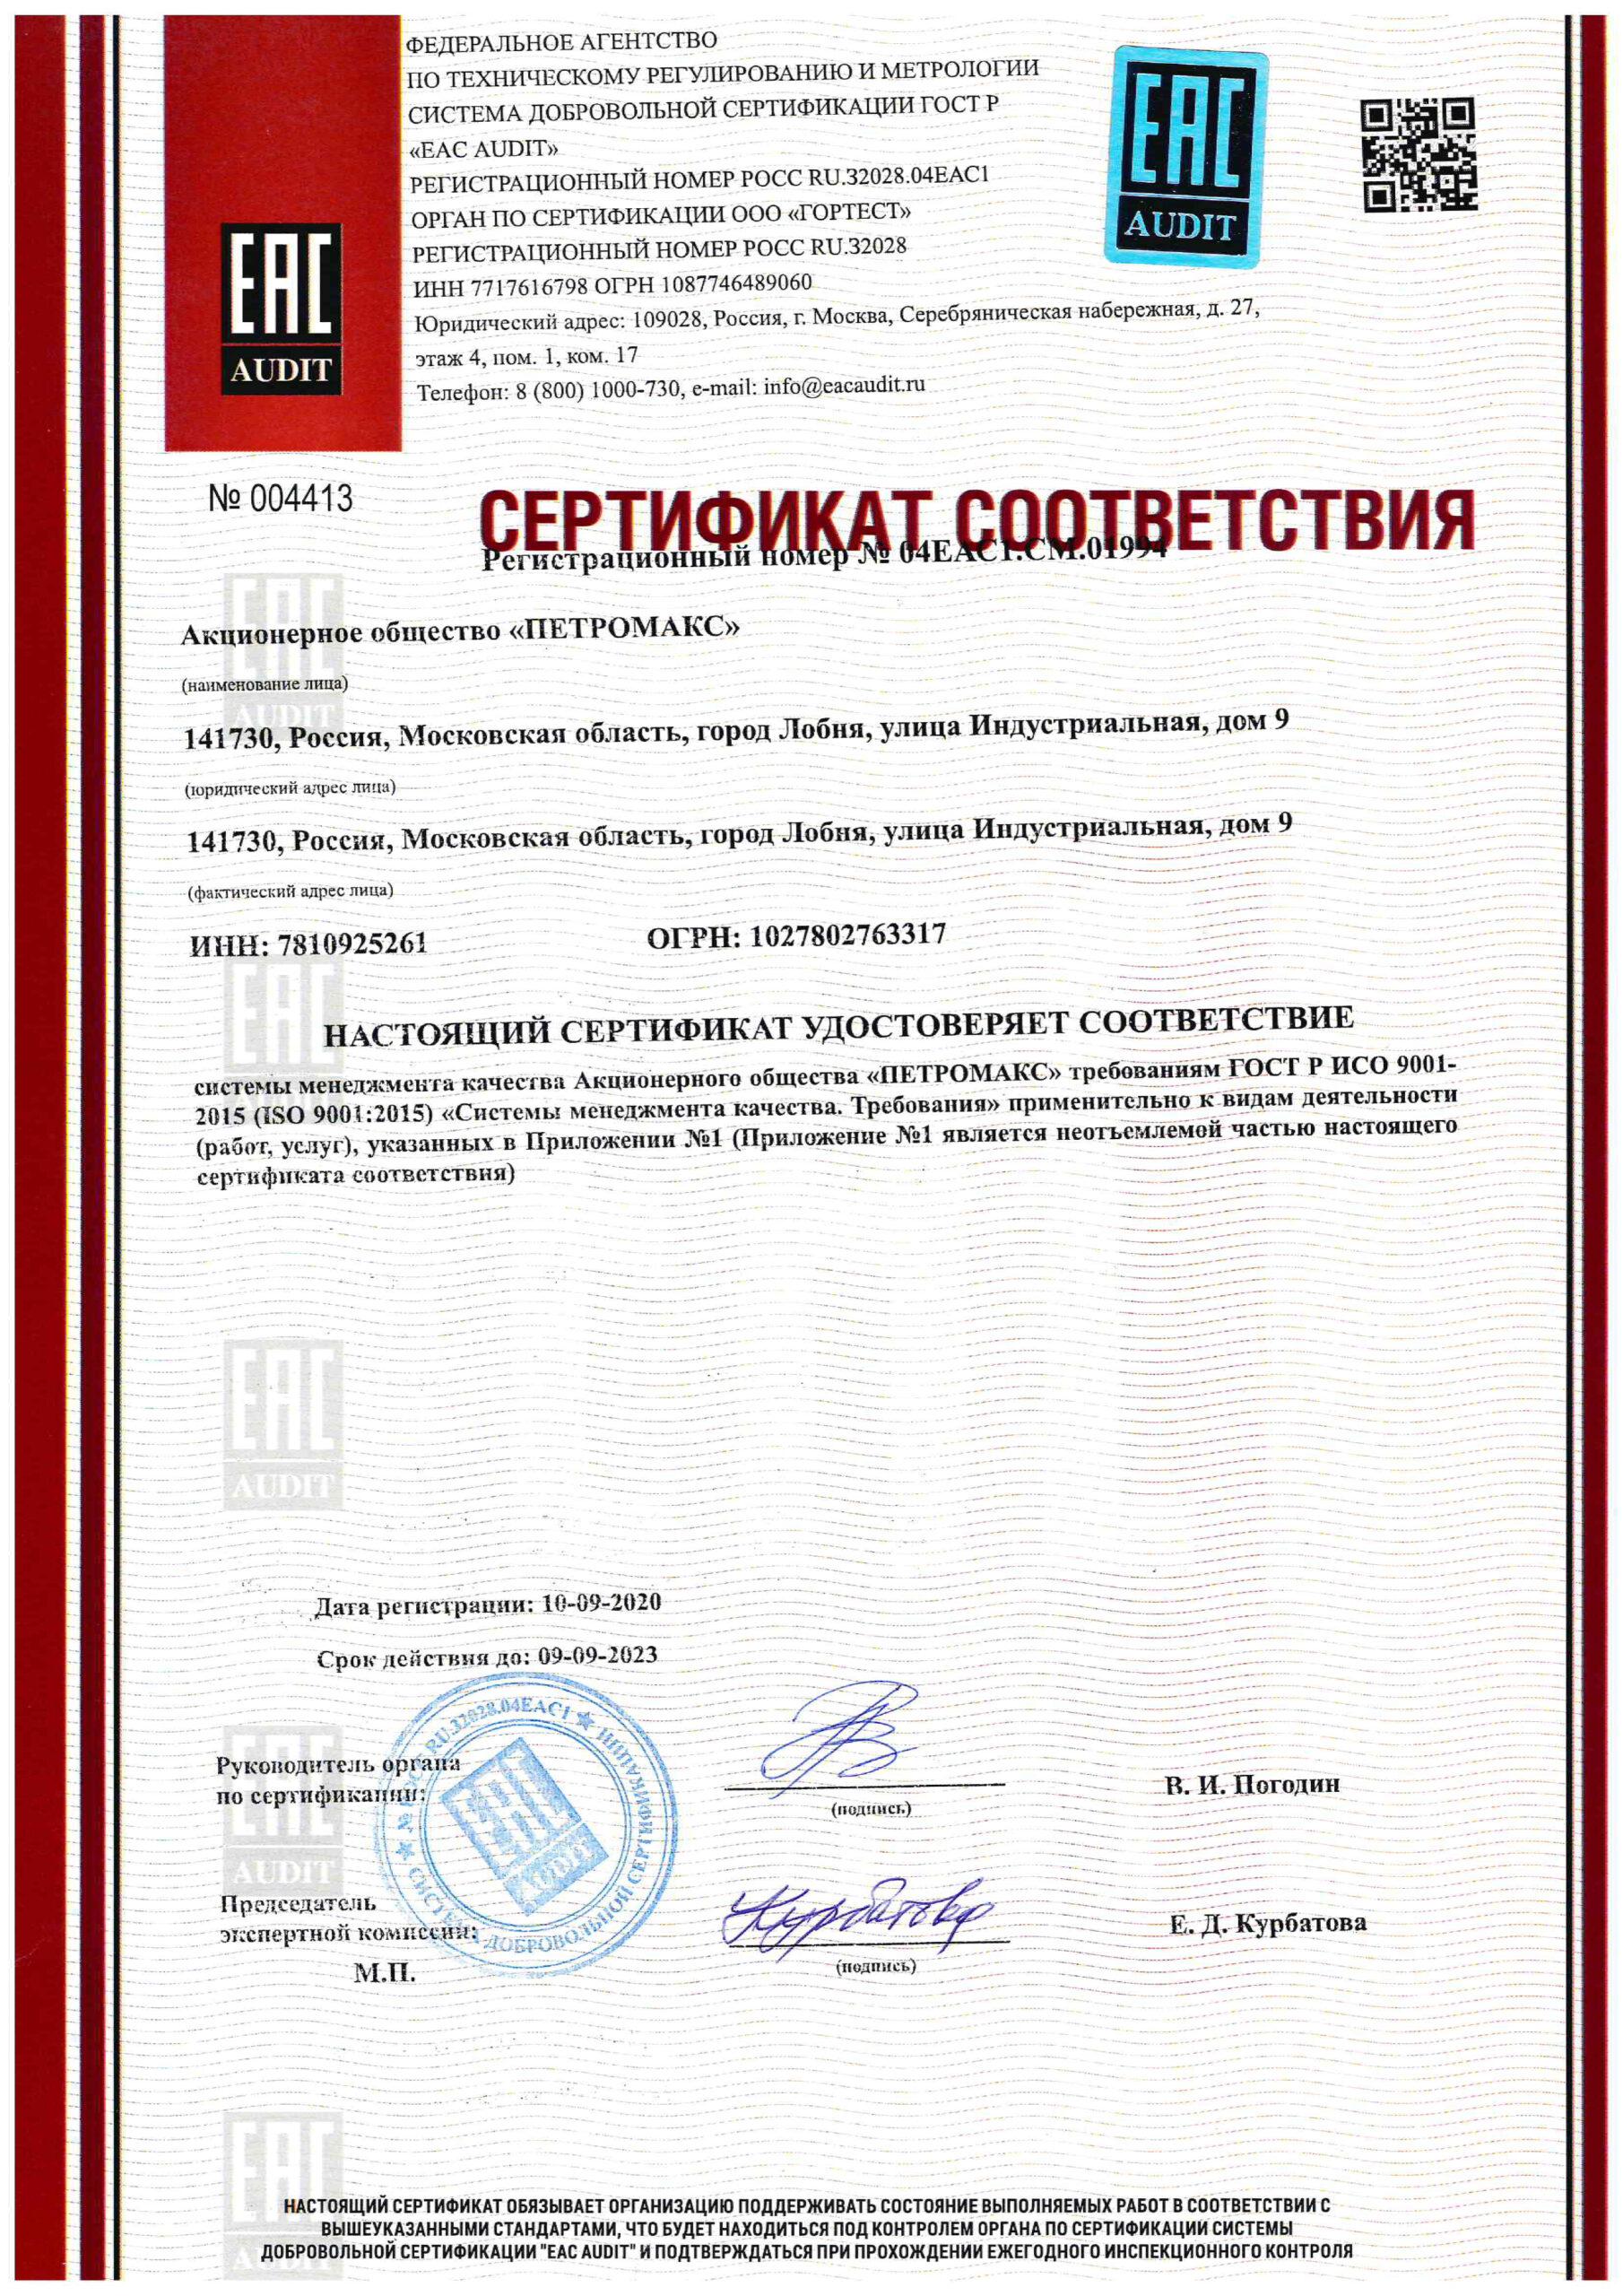 sertifikat-sootvetstviya-%e2%84%9604eac1-cm-01996_1-1